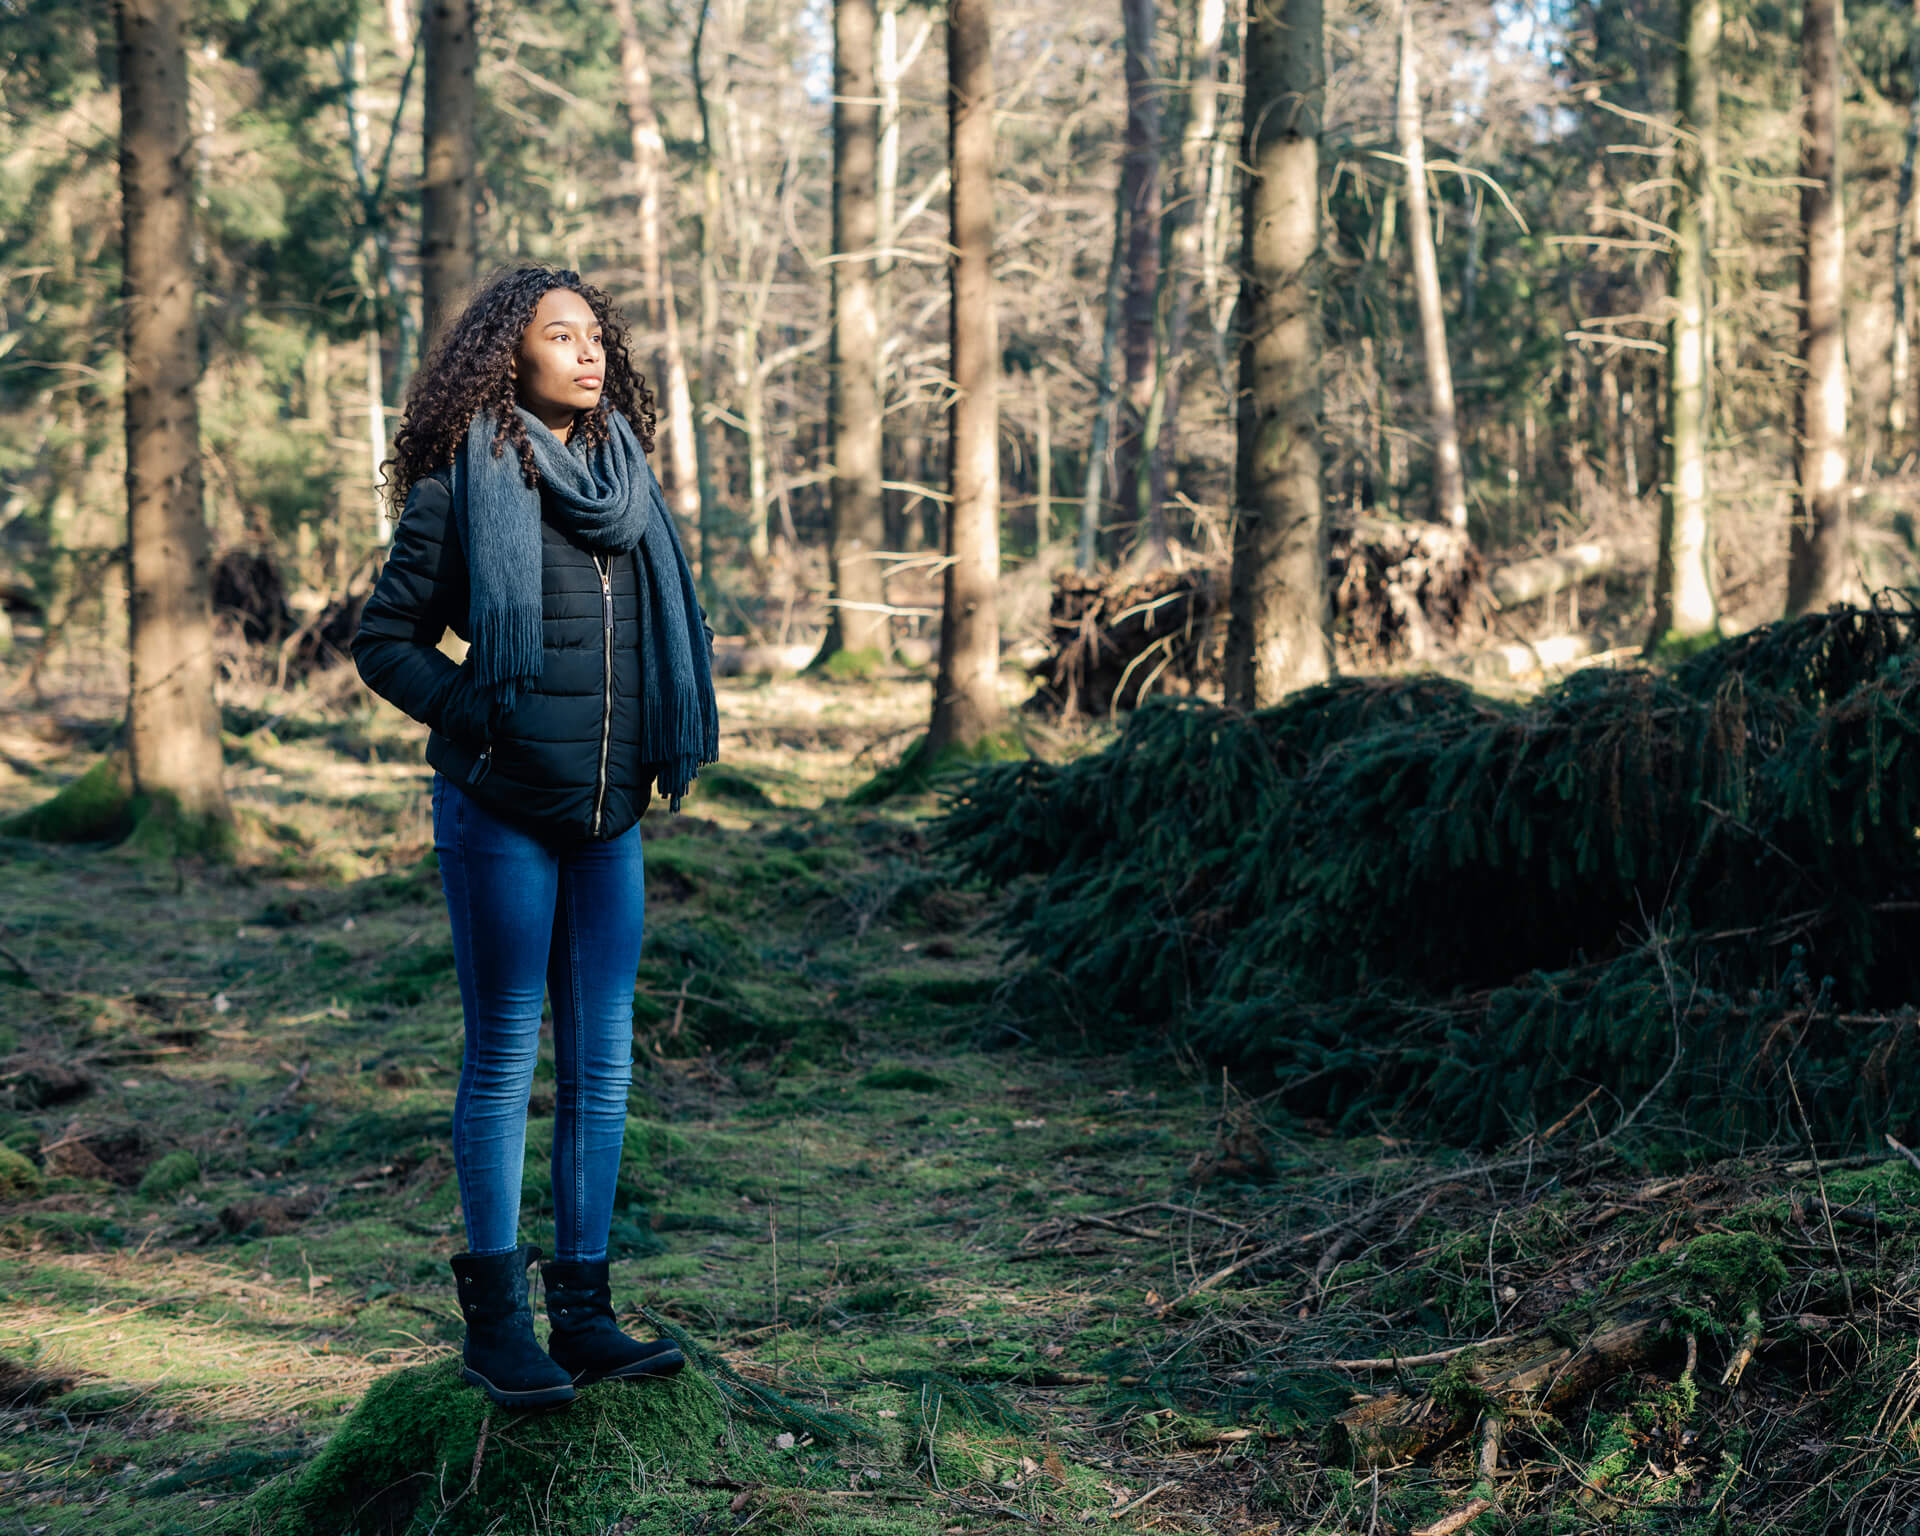 20180218_teens_woodlandwonderland_a_480